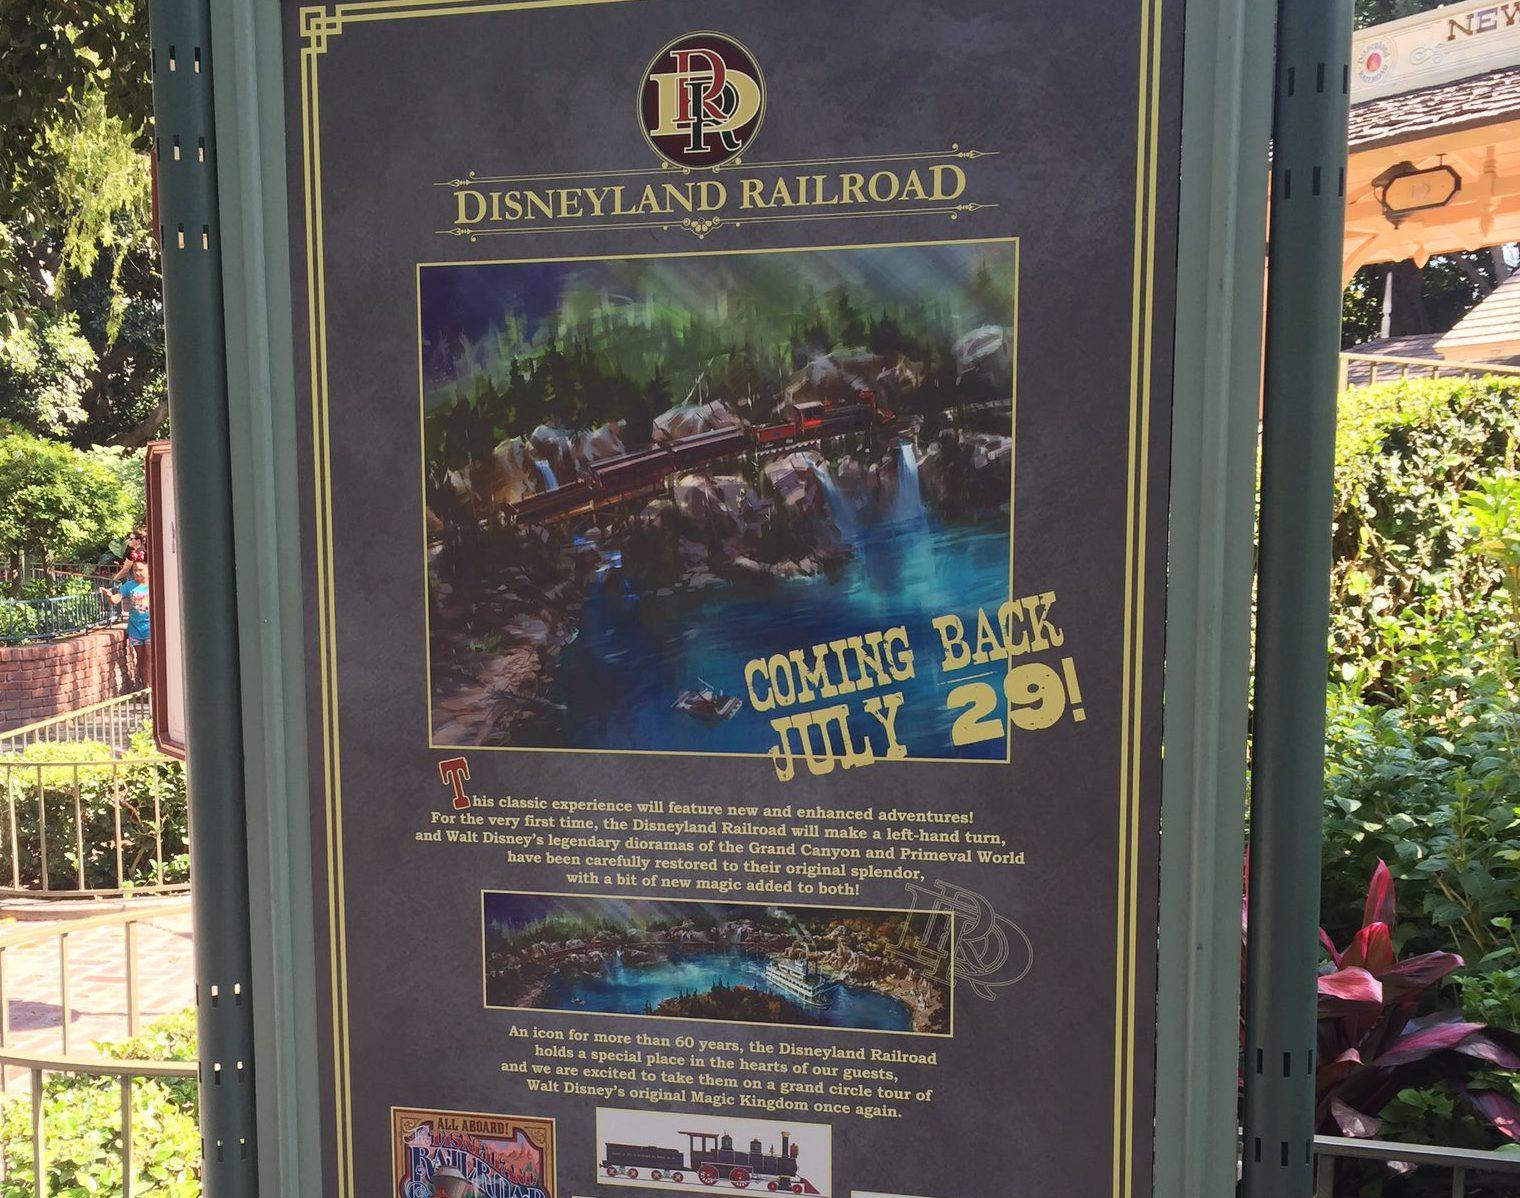 Disneyland Prepares for Return of Fan-Favorite Attractions, Railroad Begins Test Cycles